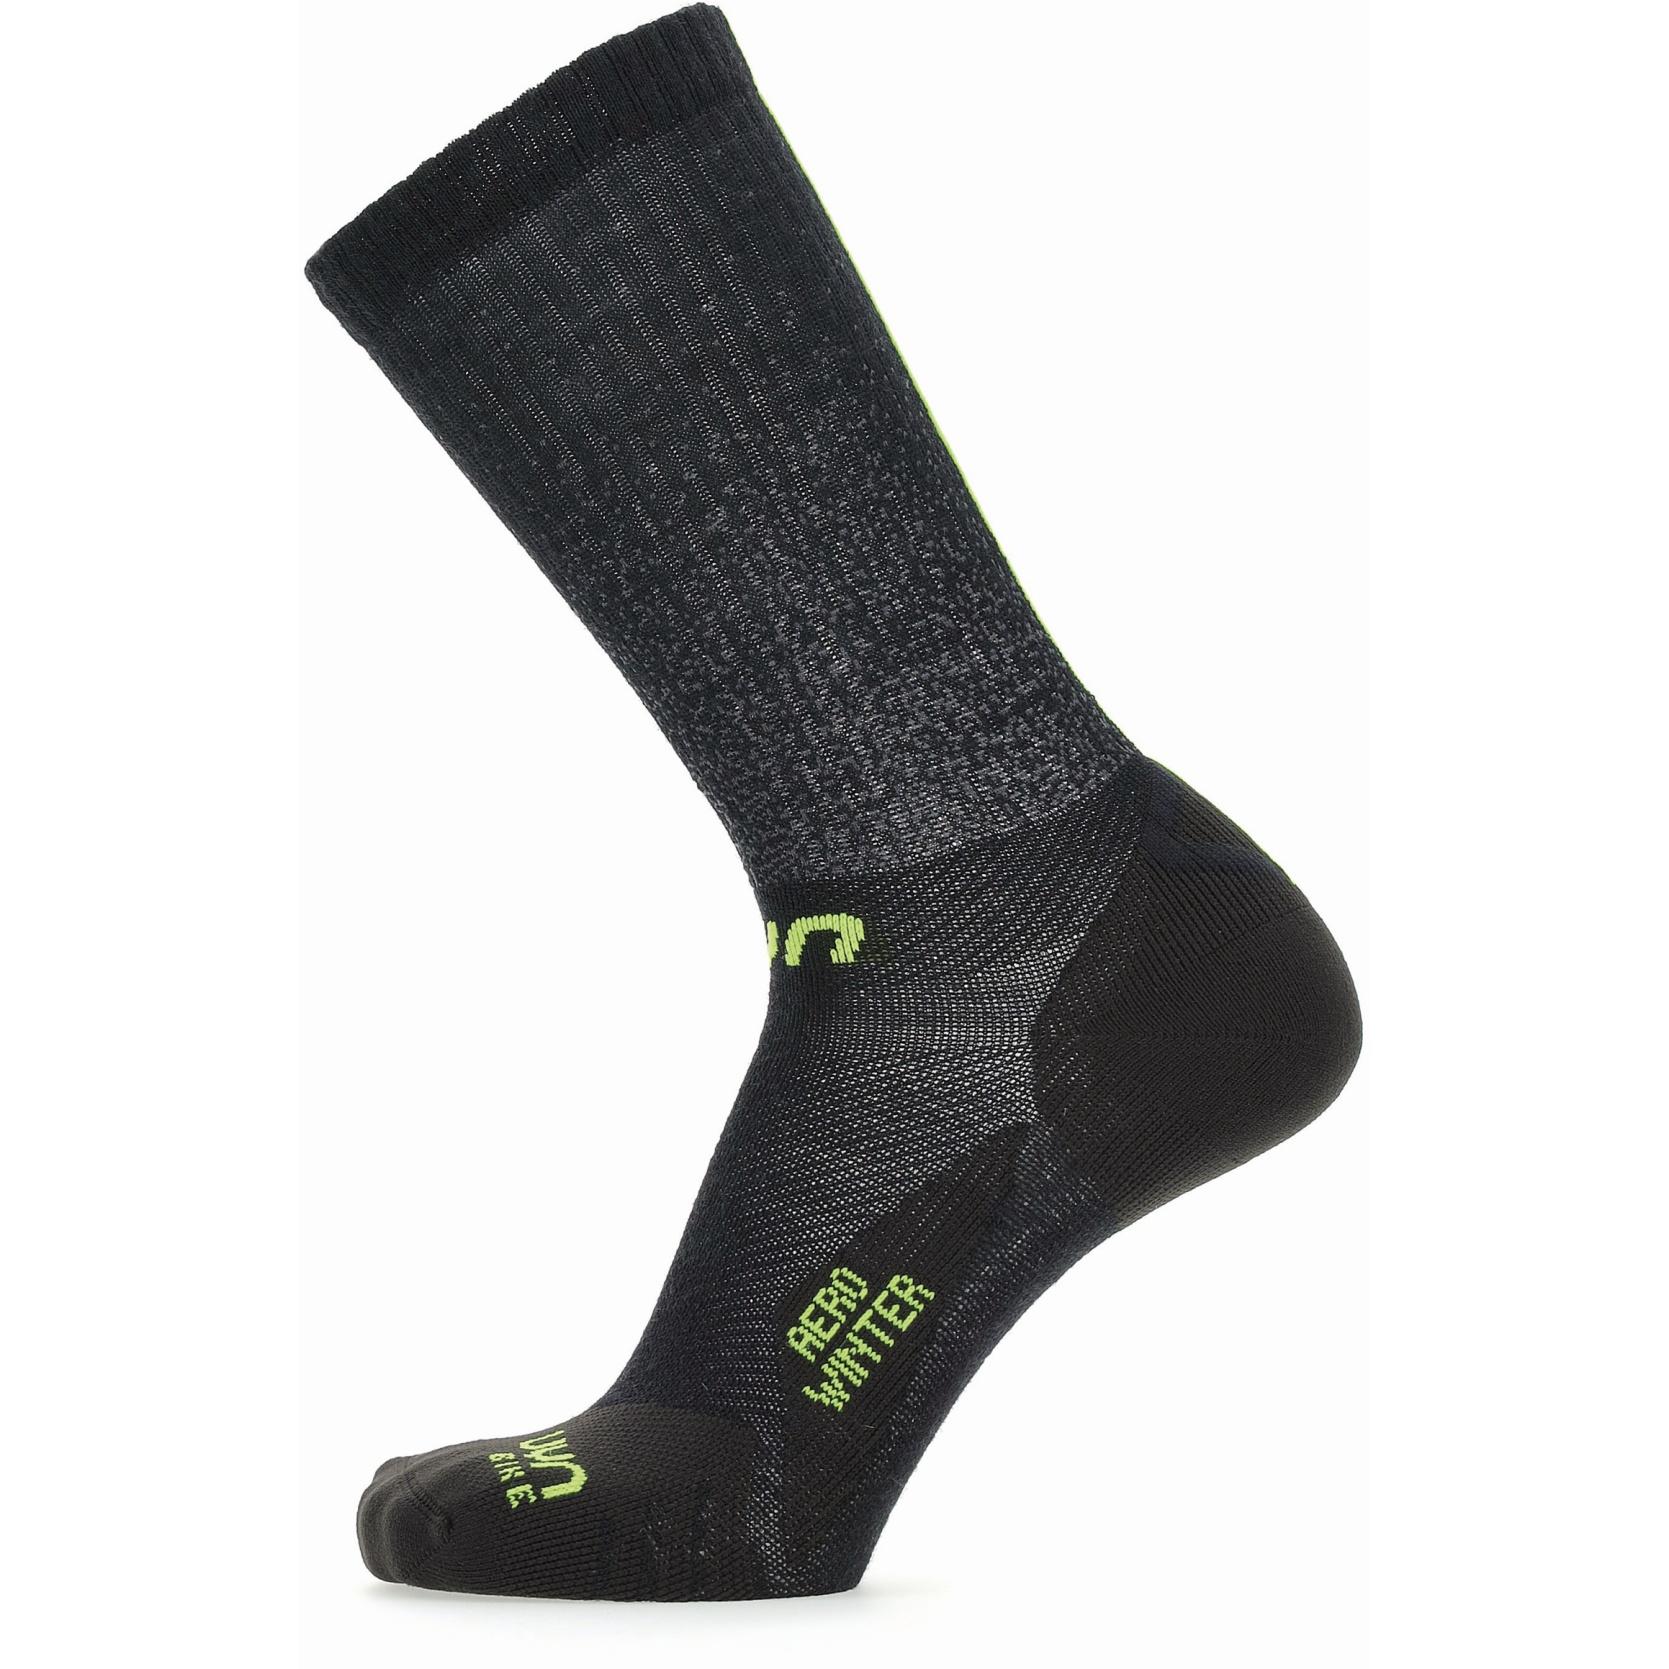 UYN Cycling Aero Winter Socken - Black/Lime